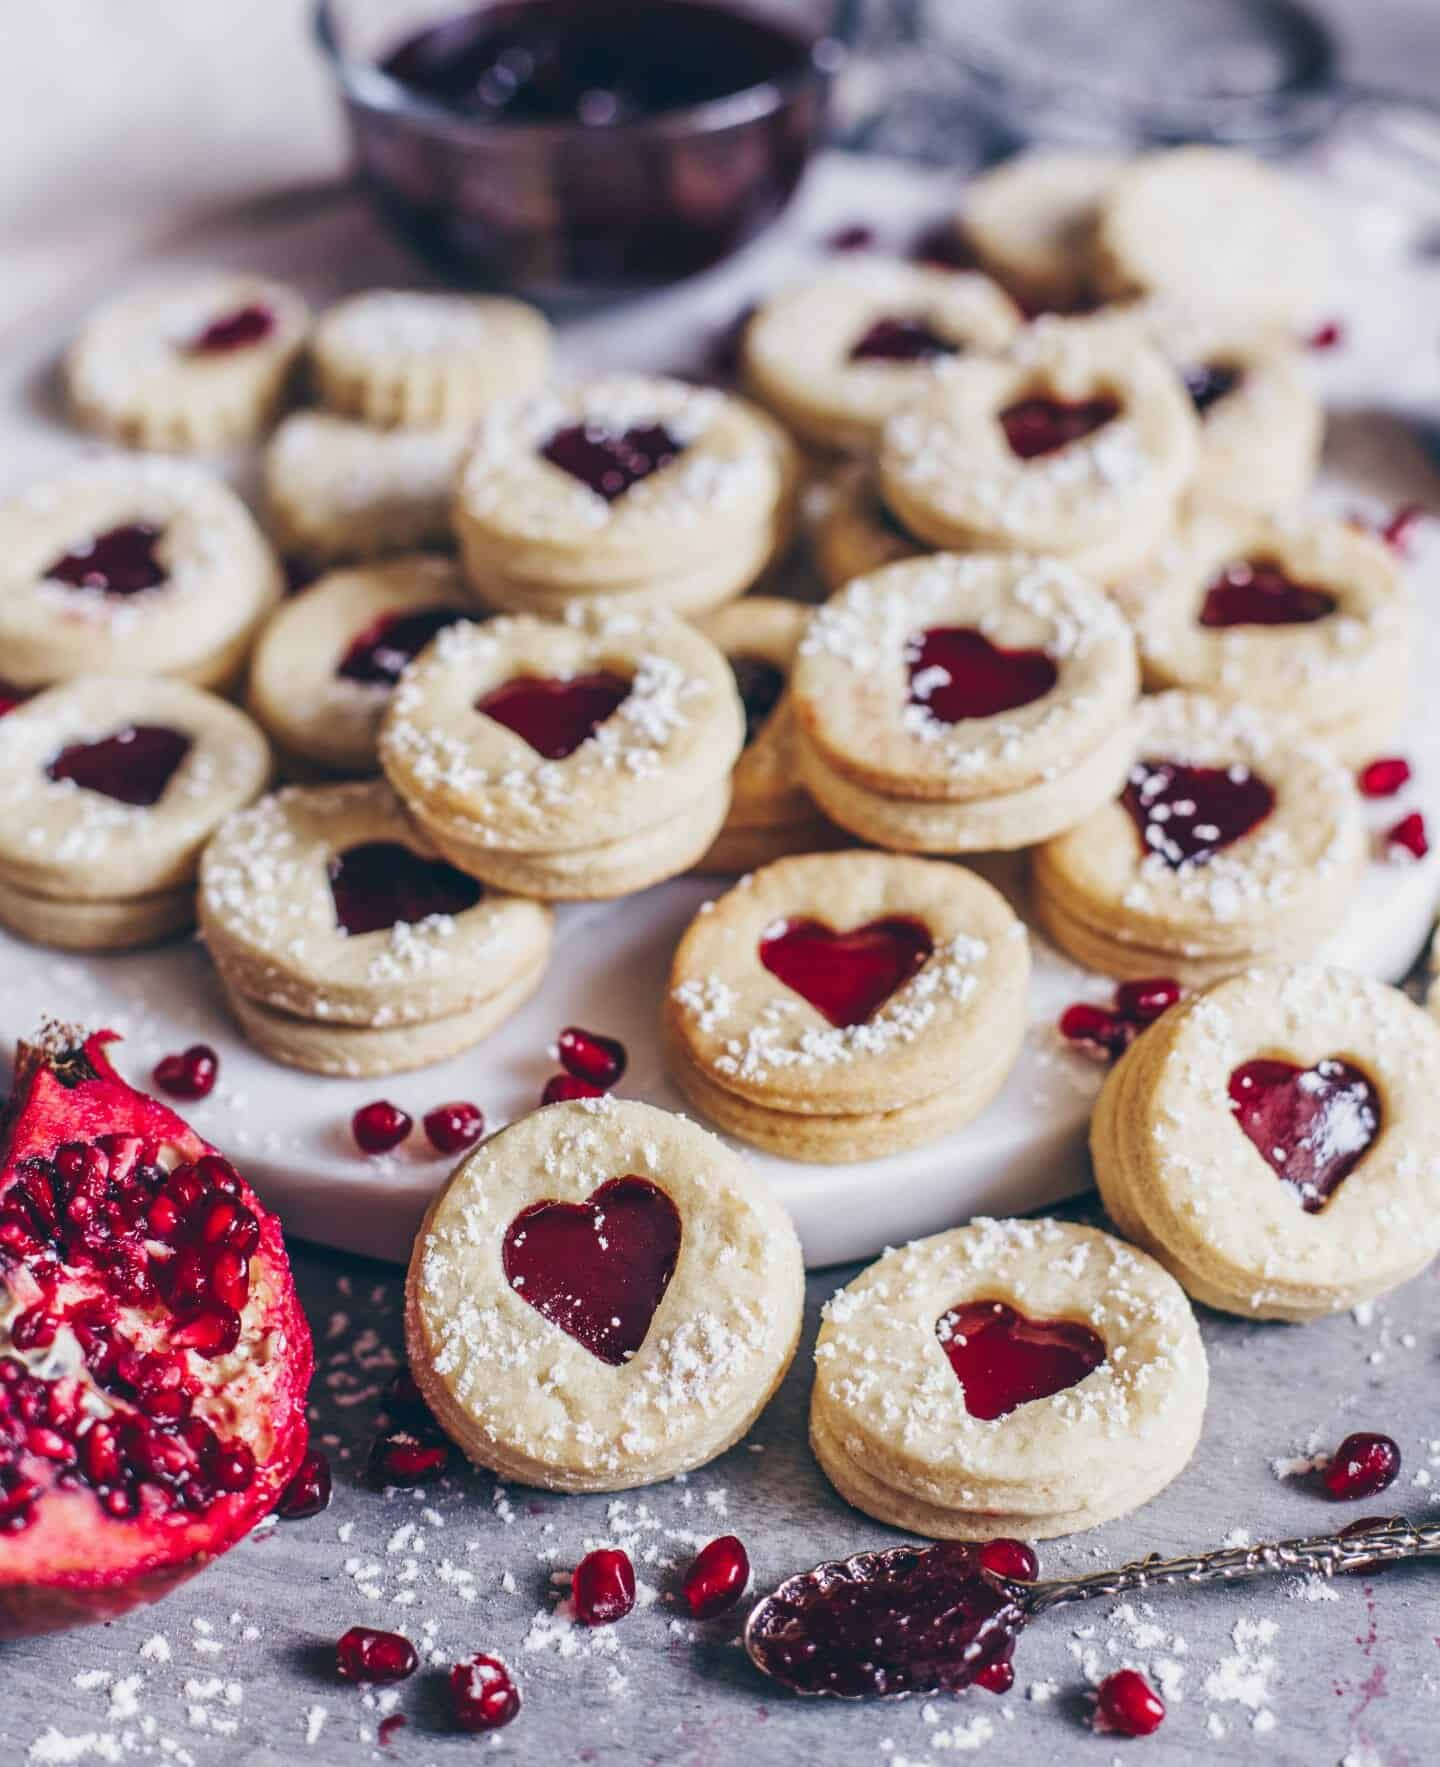 leckere vegane kekse mit marmeladenf llung spitzbuben pl tzchen bianca zapatka. Black Bedroom Furniture Sets. Home Design Ideas